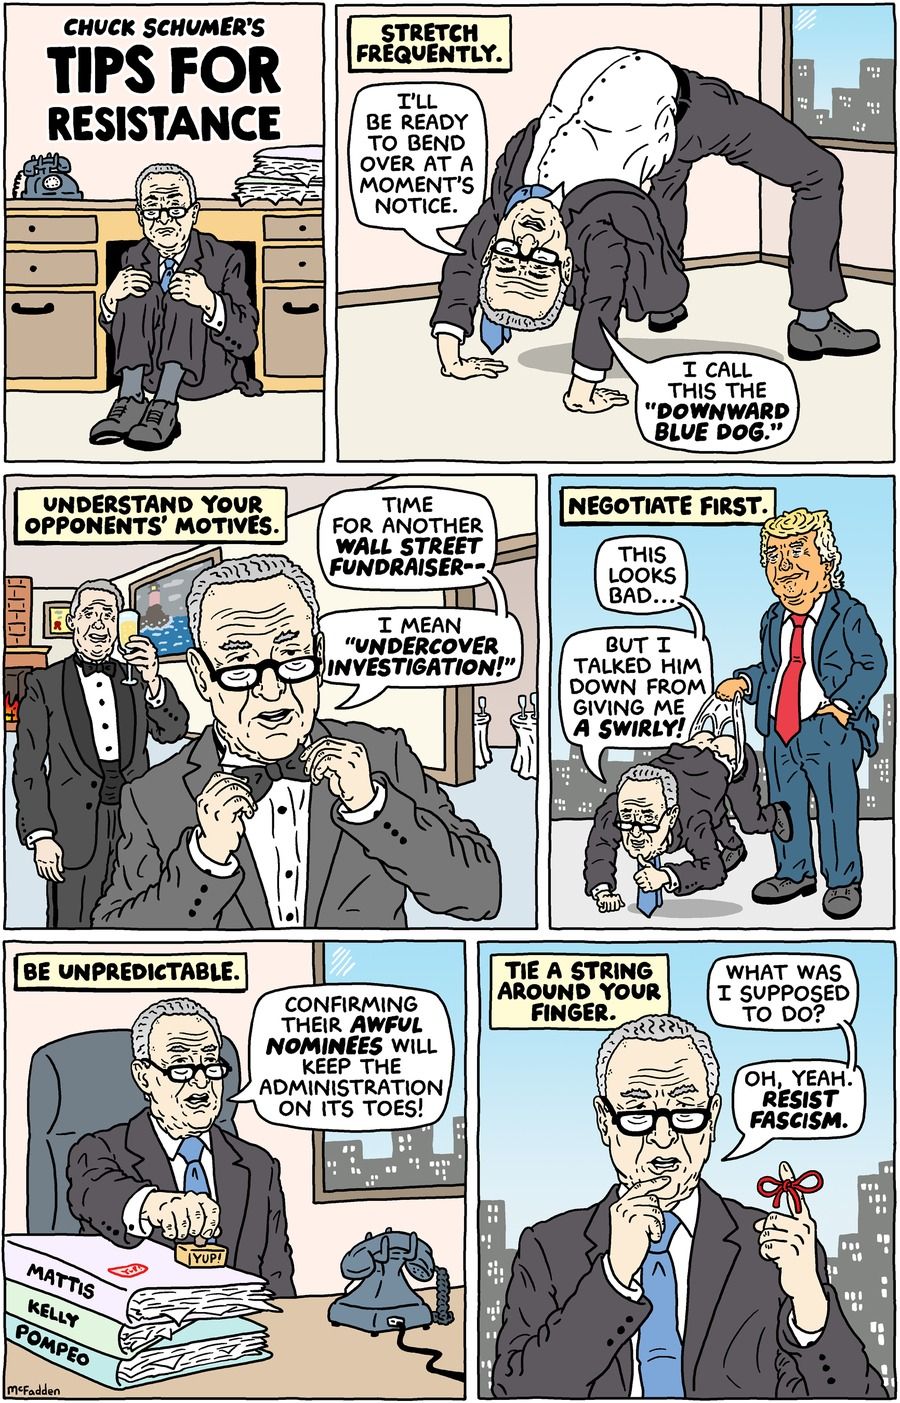 Brian McFadden for Jan 29, 2017 Comic Strip